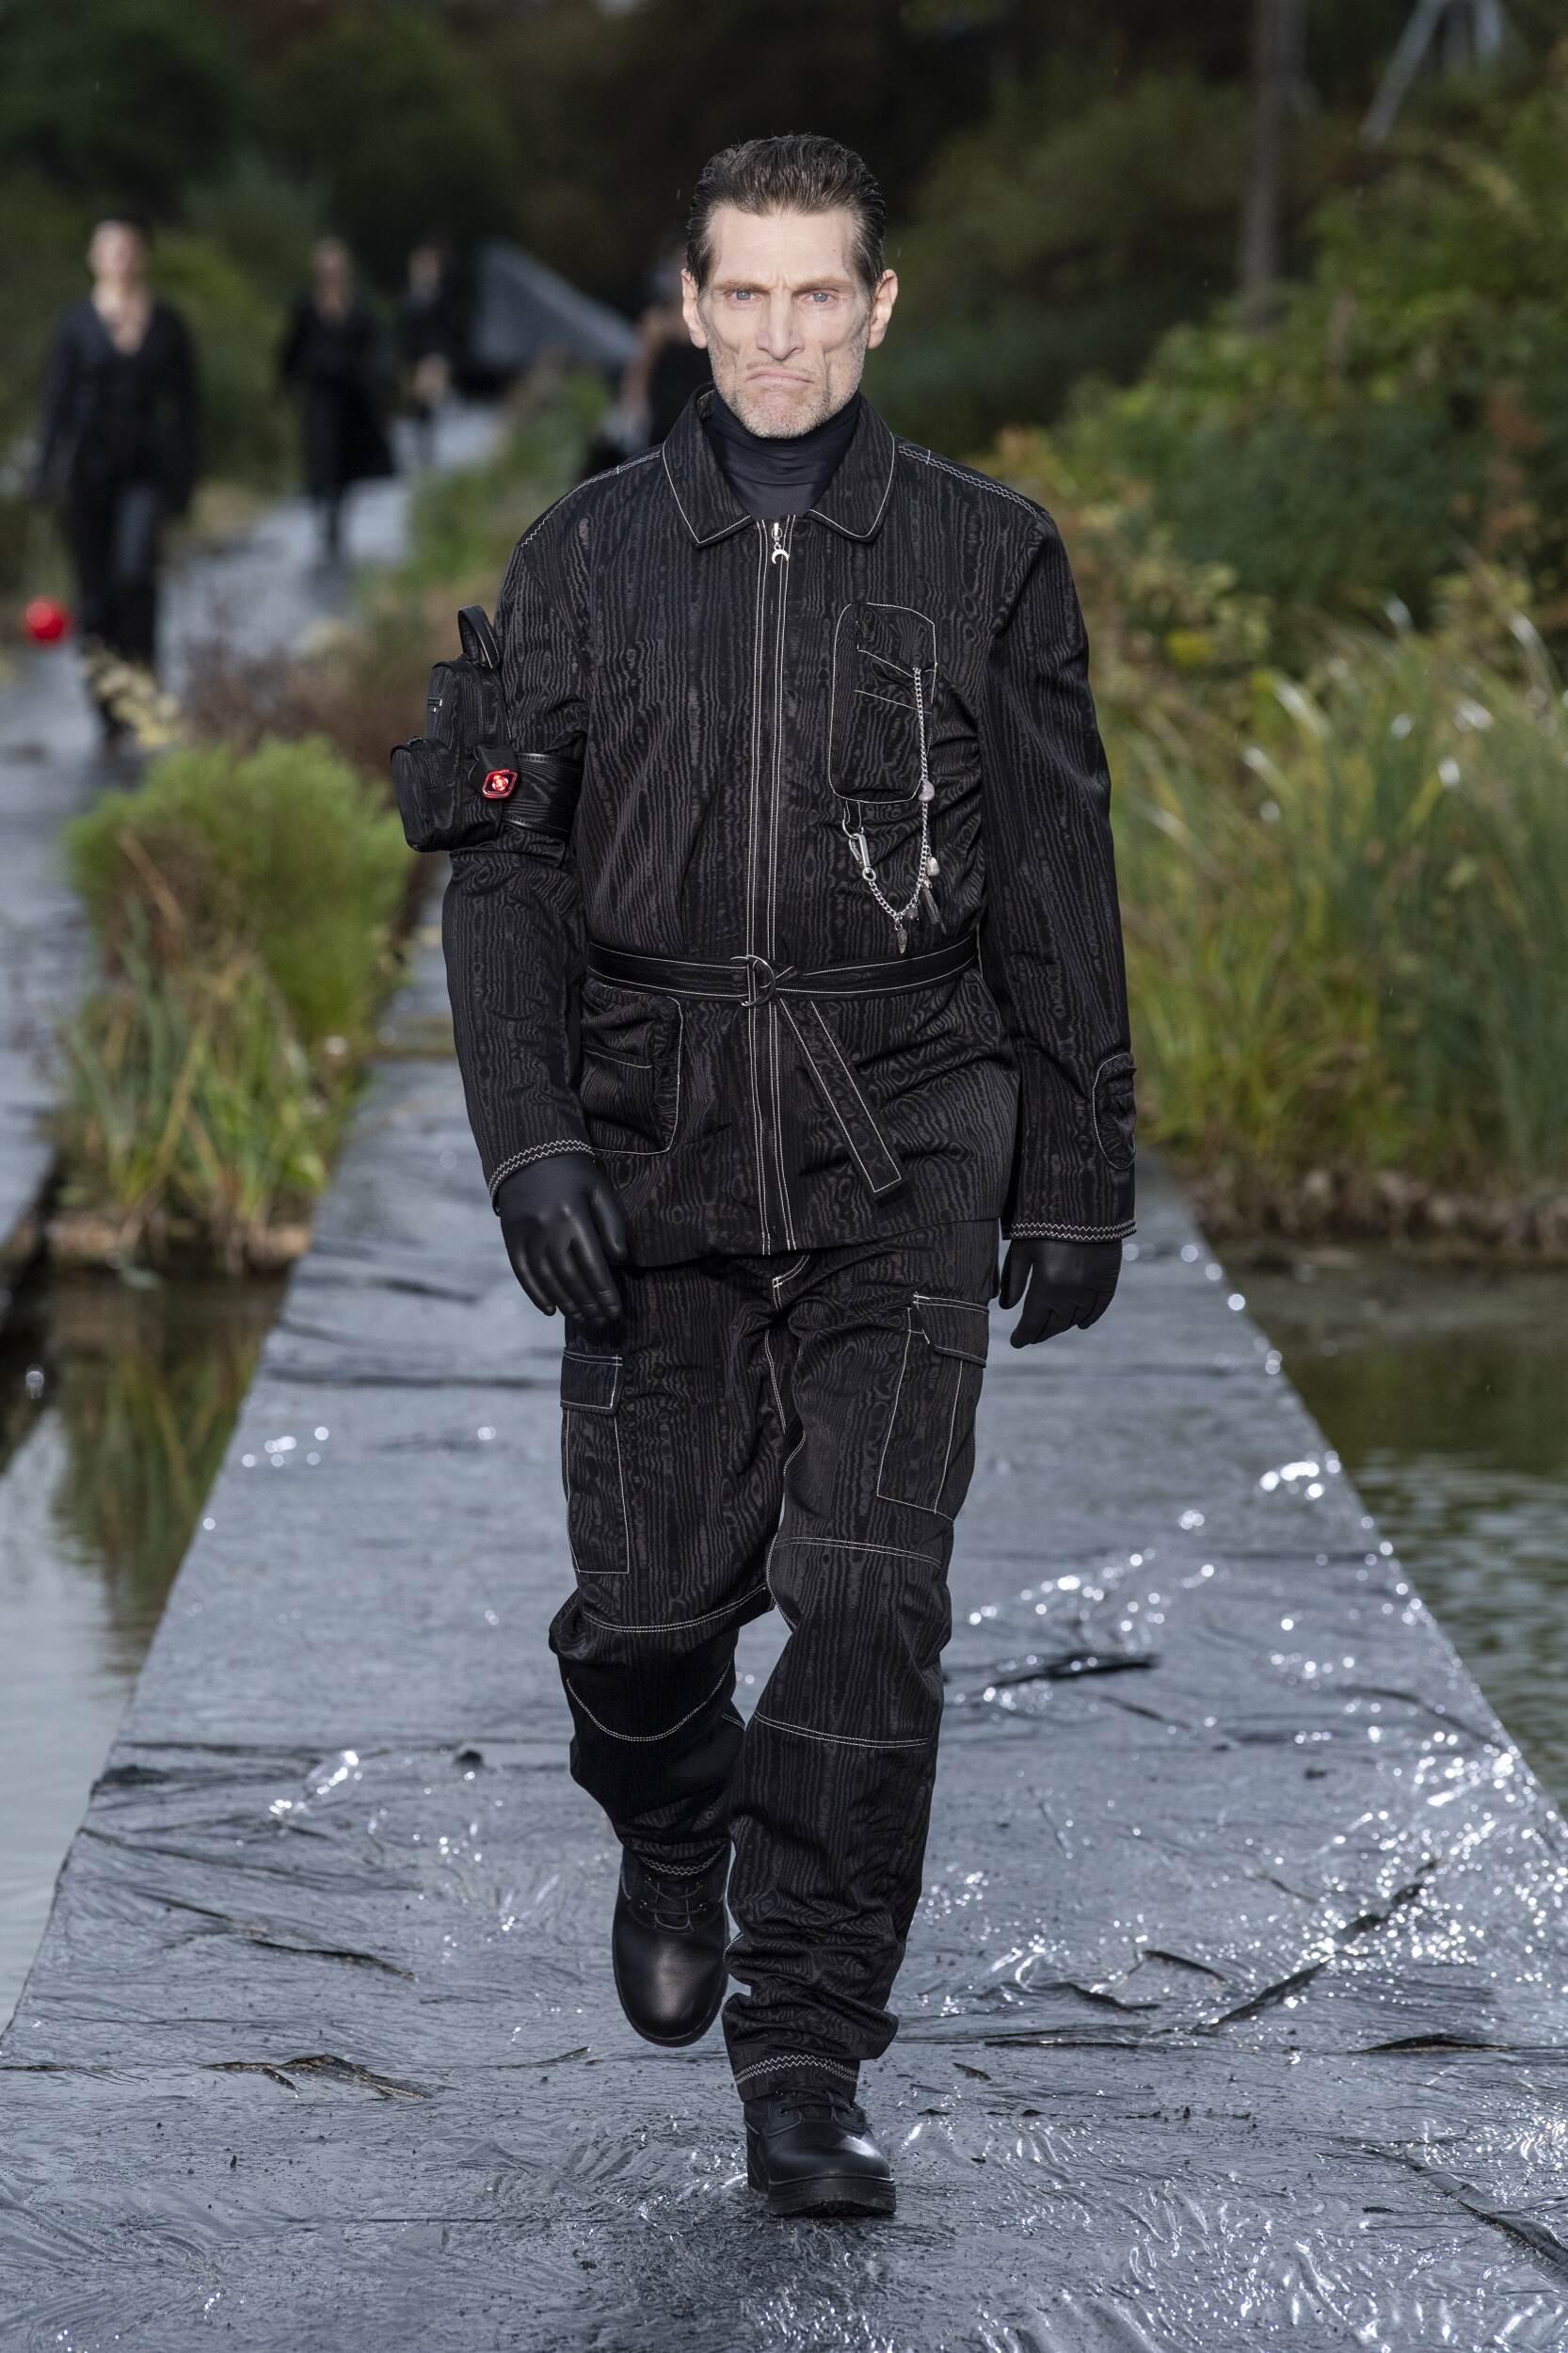 SS 2020 Marine Serre Fashion Show